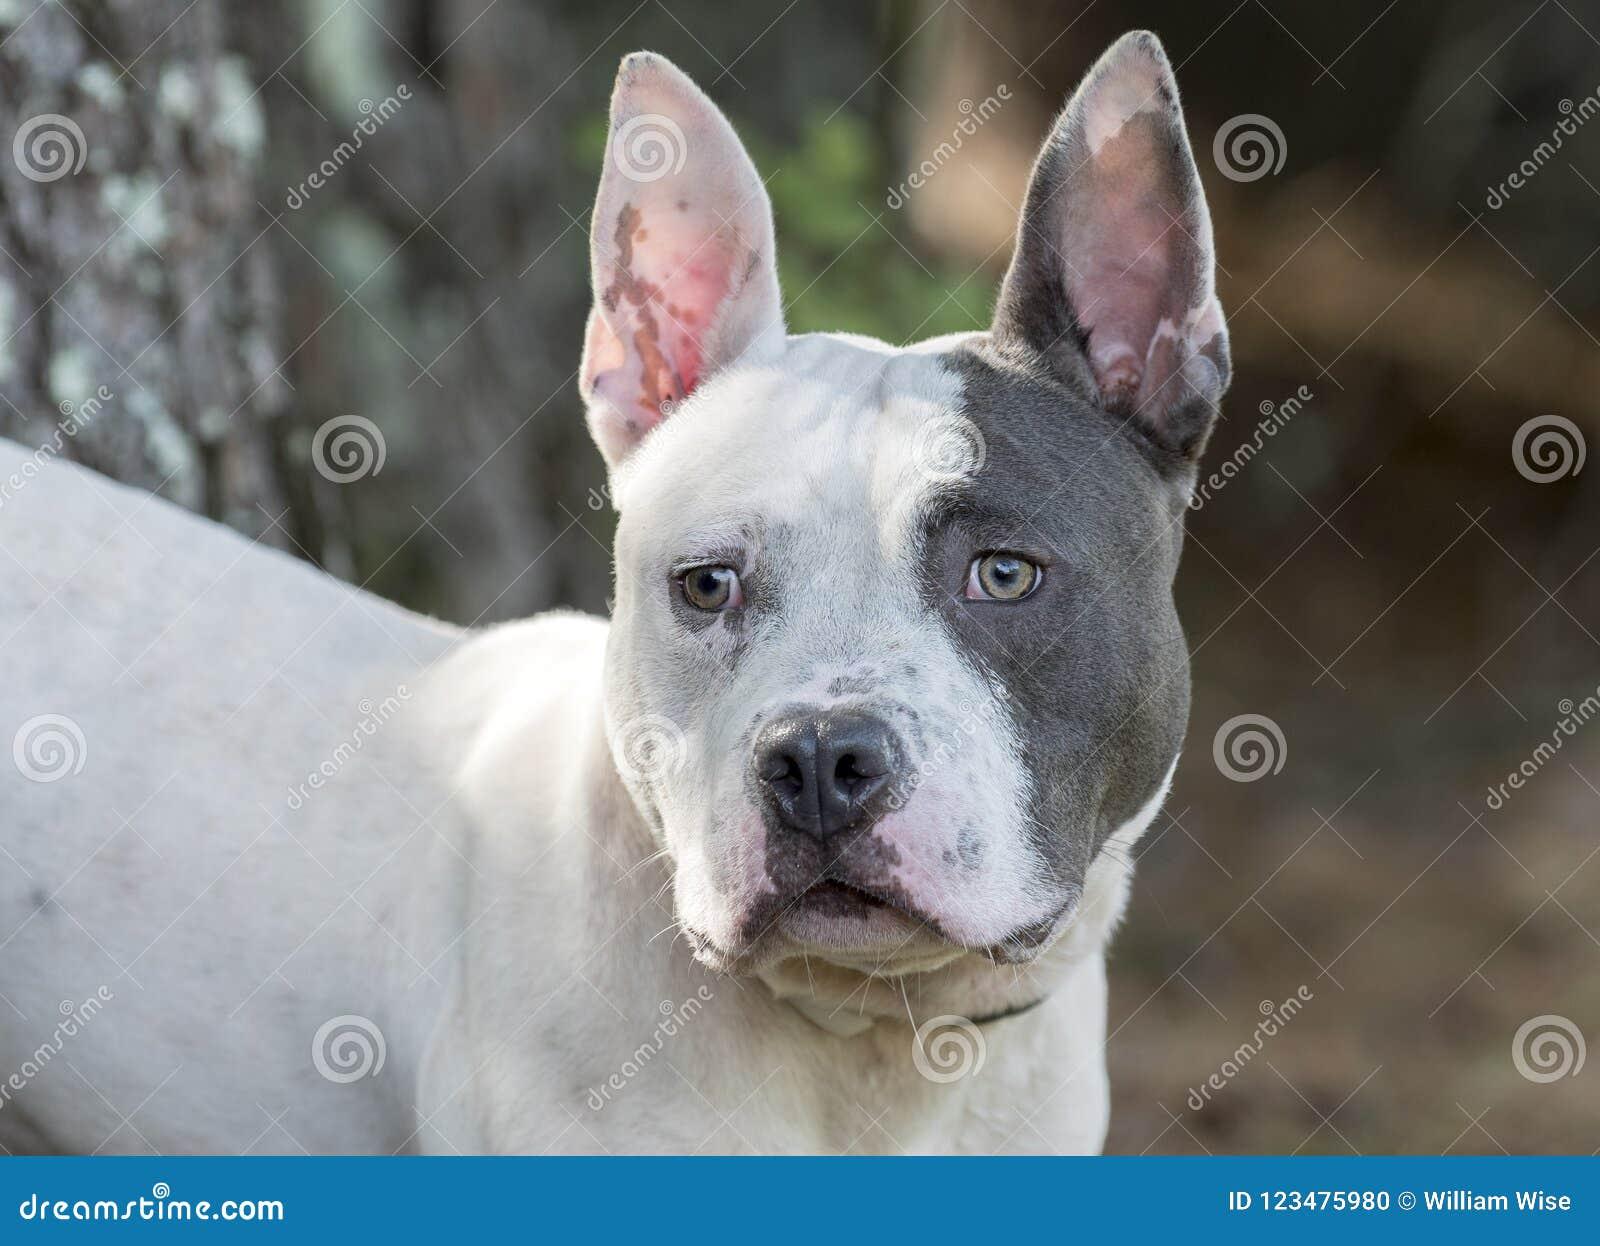 Pitbull Terrier And French Bulldog Mixed Breed Dog Stock Photo